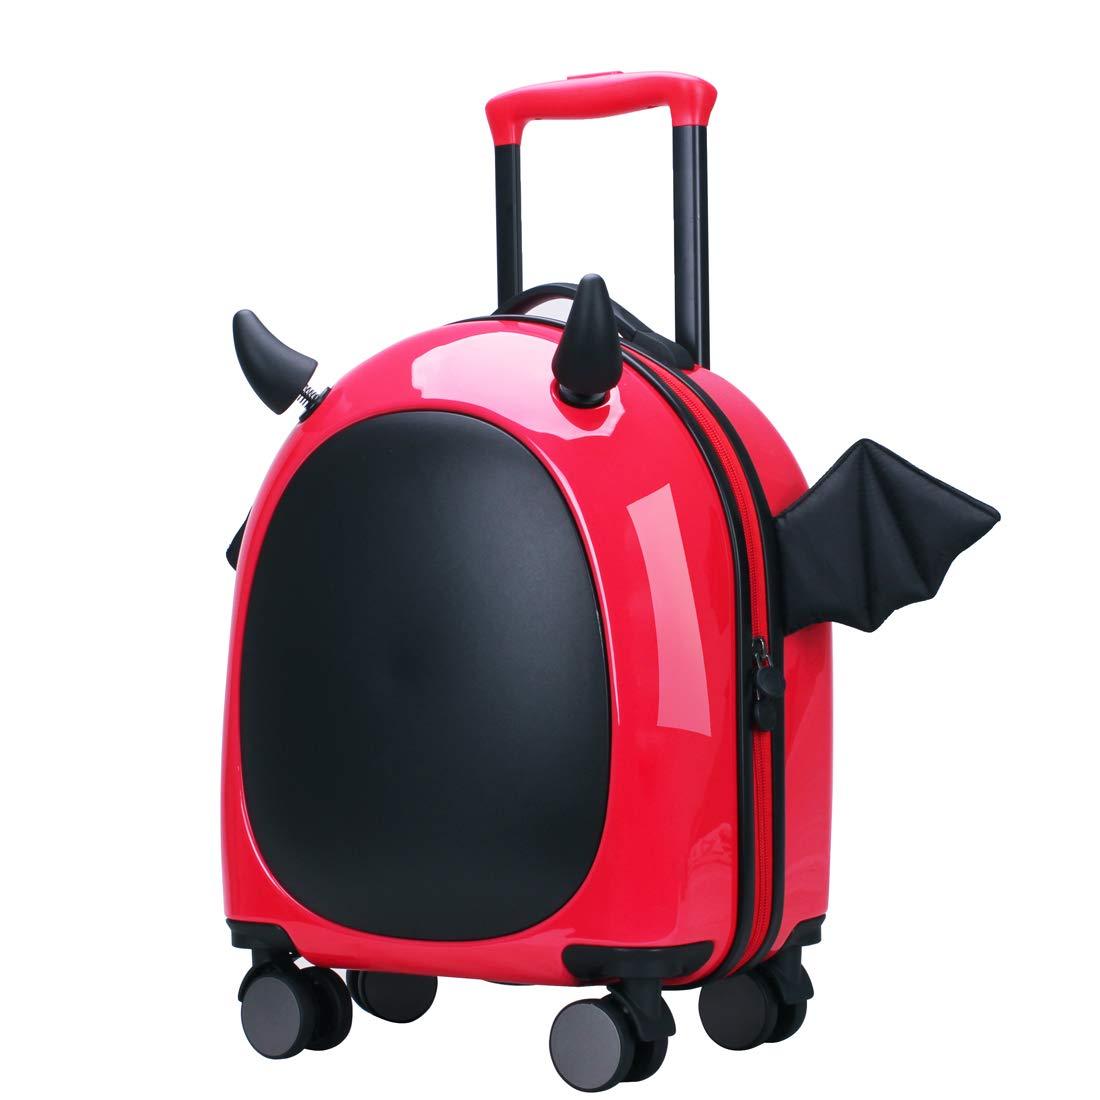 Ginza Travel Little devil Unisex Spinner Kids Luggage 16 Inch